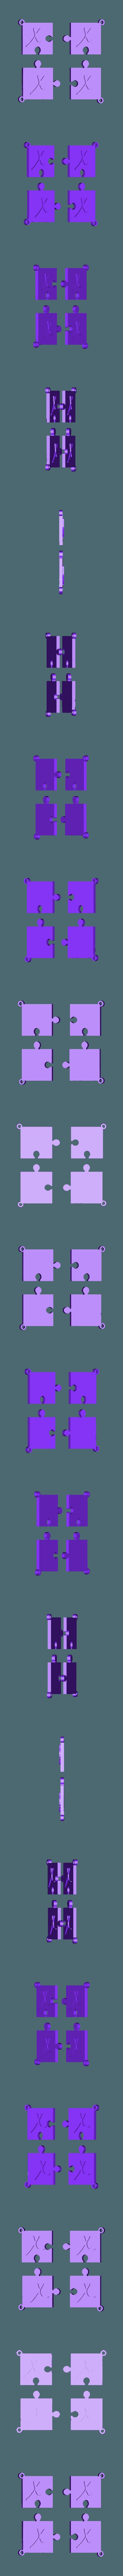 puzzle x.stl Download STL file puzzle key ring • 3D printing design, catf3d